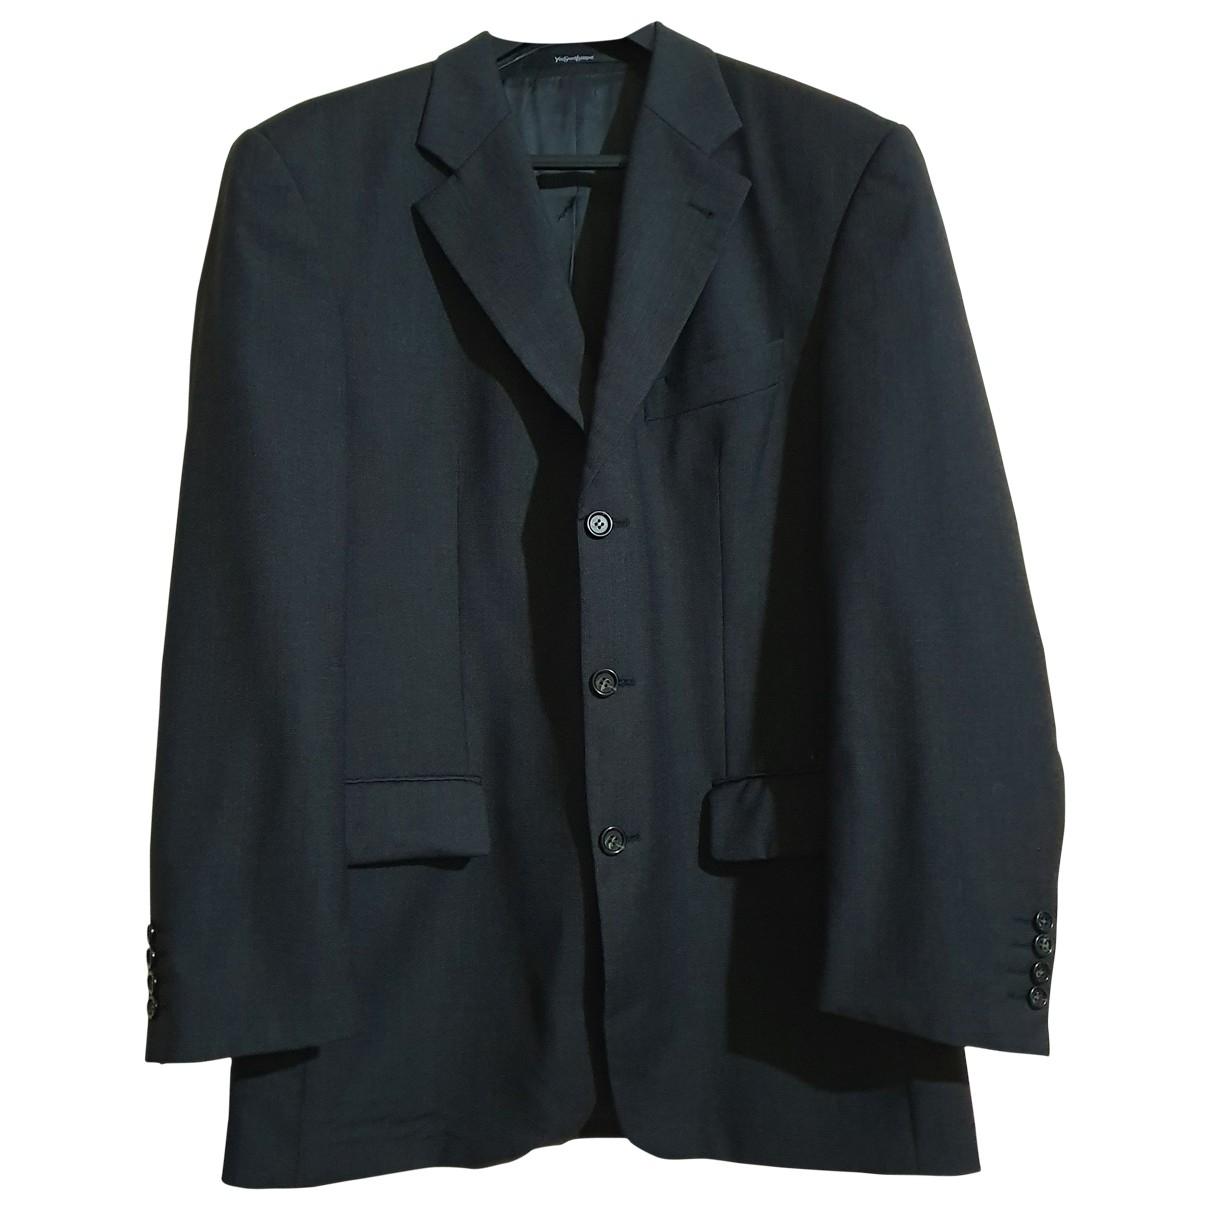 Yves Saint Laurent \N Grey Wool jacket  for Men XL International